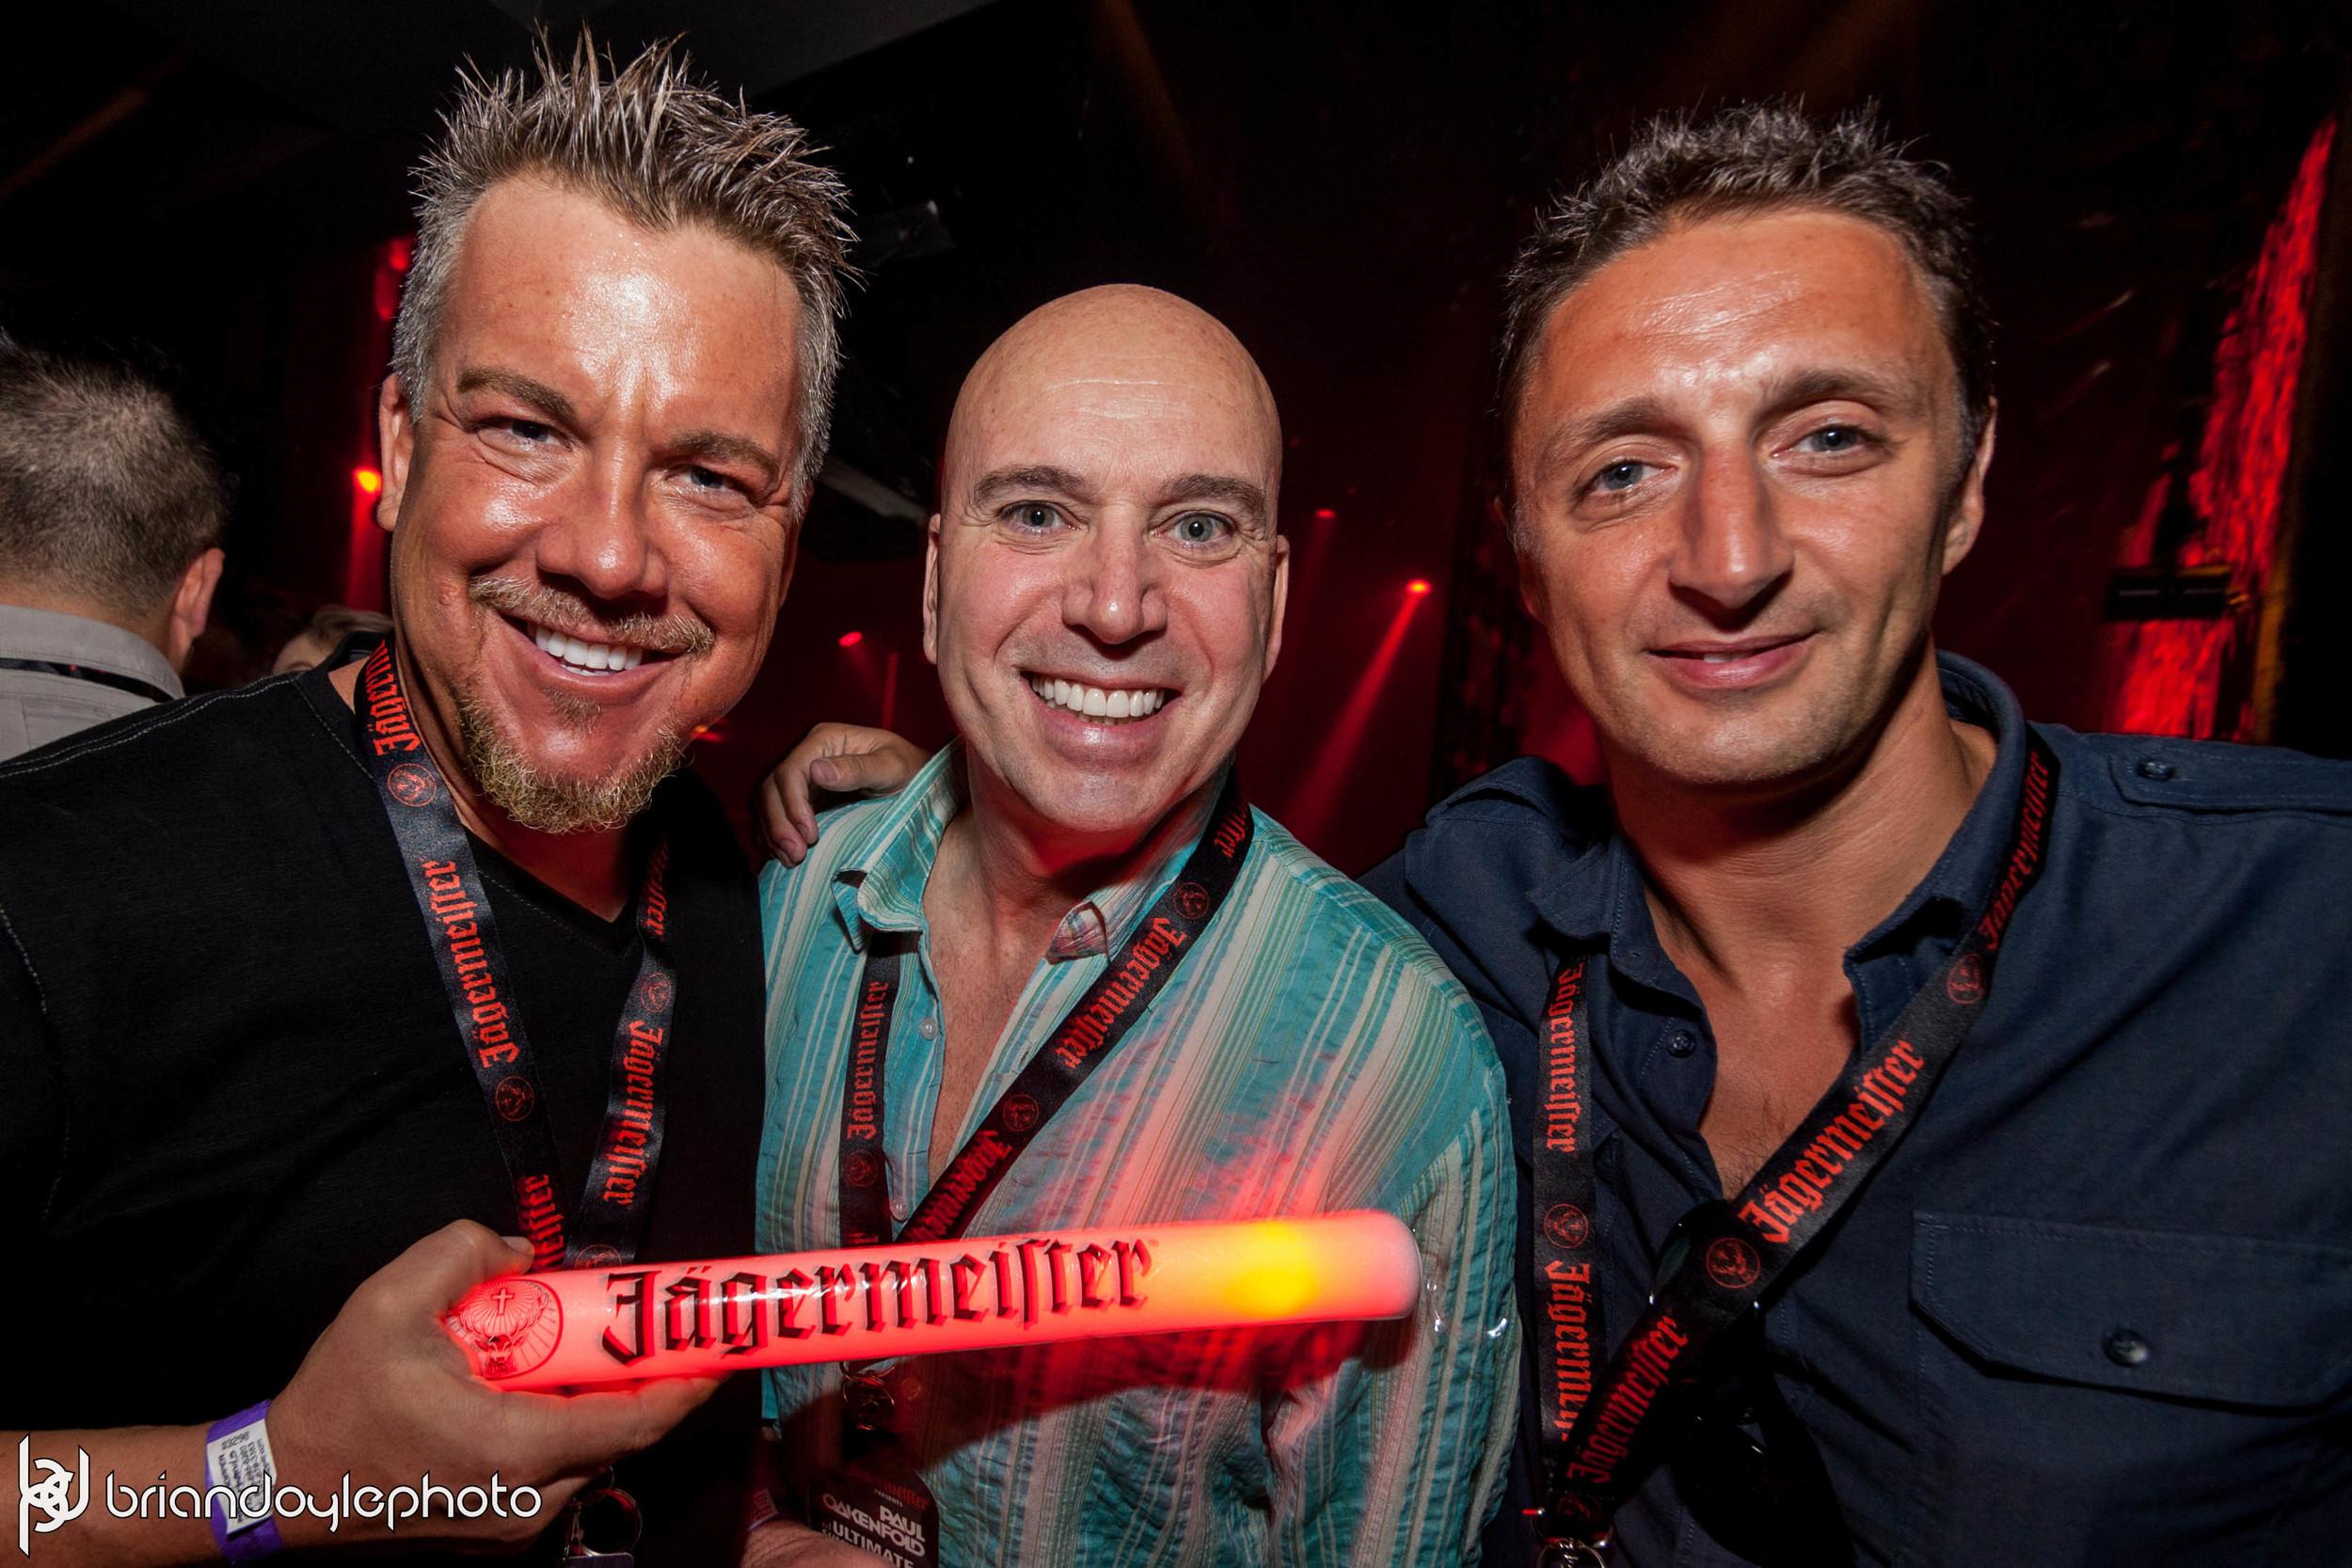 Jagermeister Presents - Paul Oakenfold @ Avalon bdp 27.09.14-21.jpg